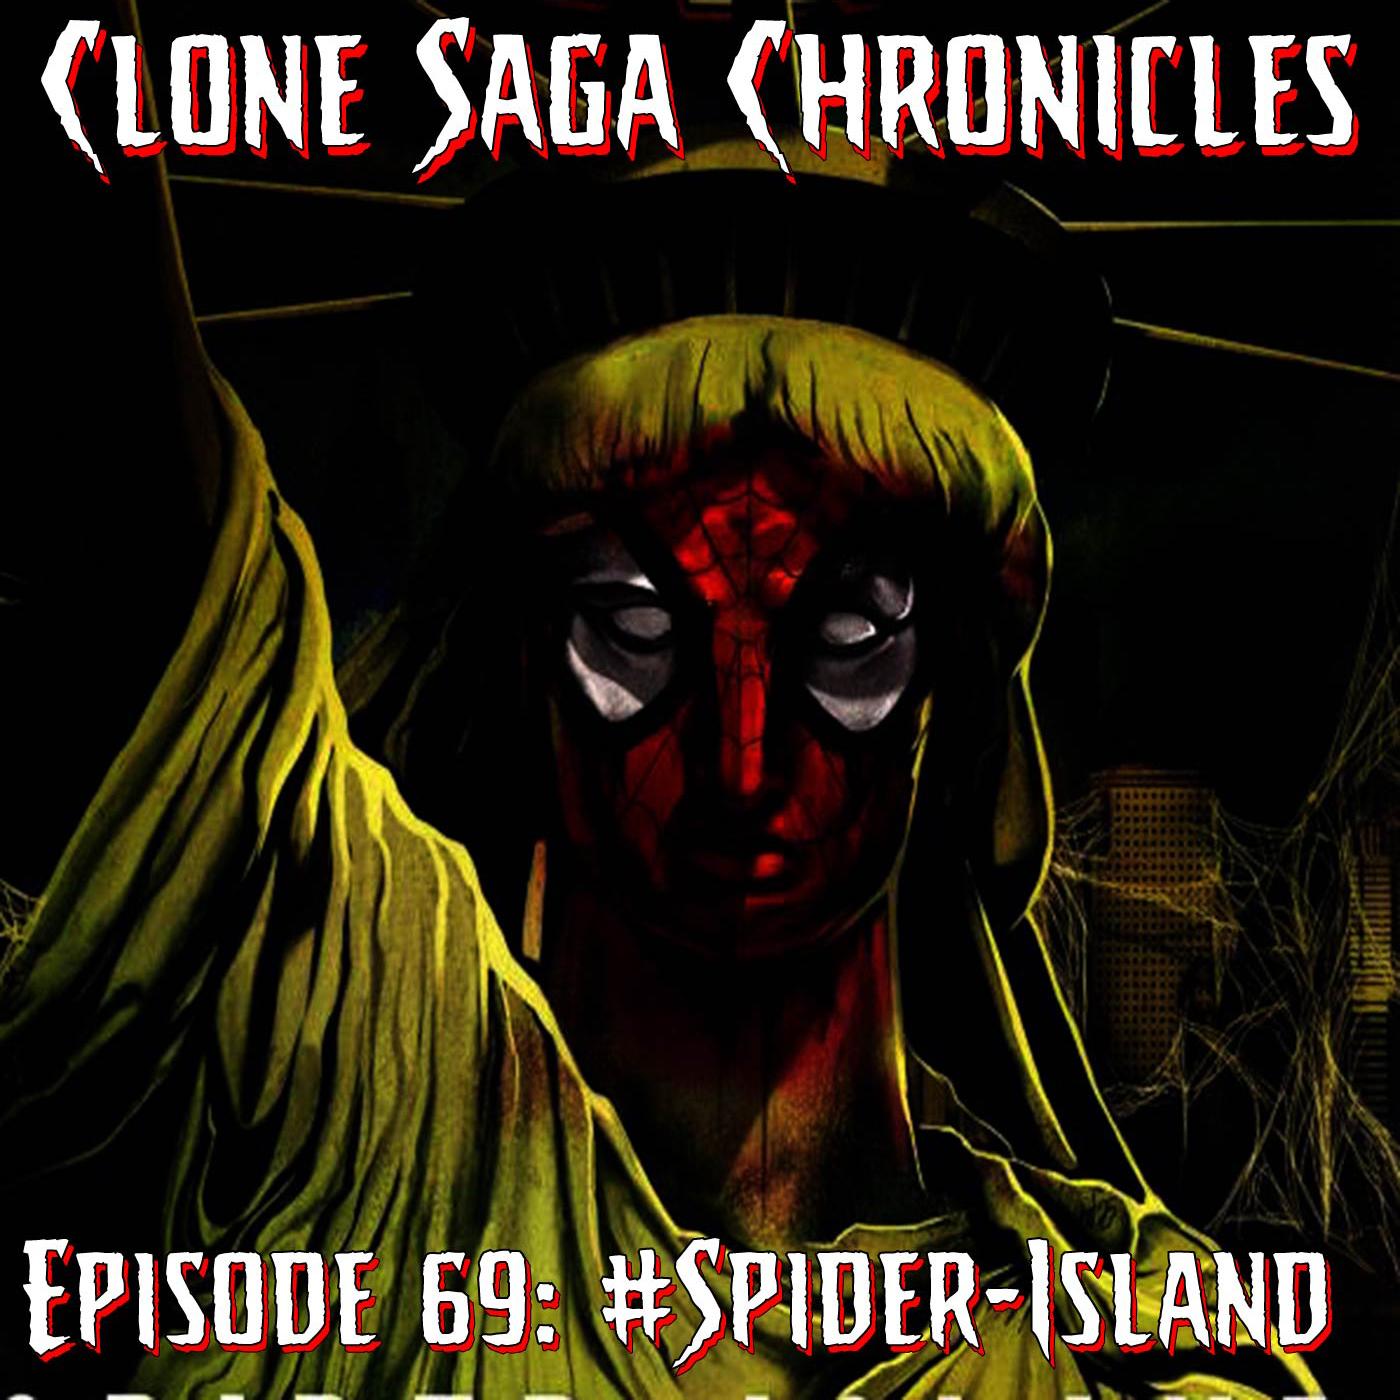 CSC Episode 69: #Spider-Island